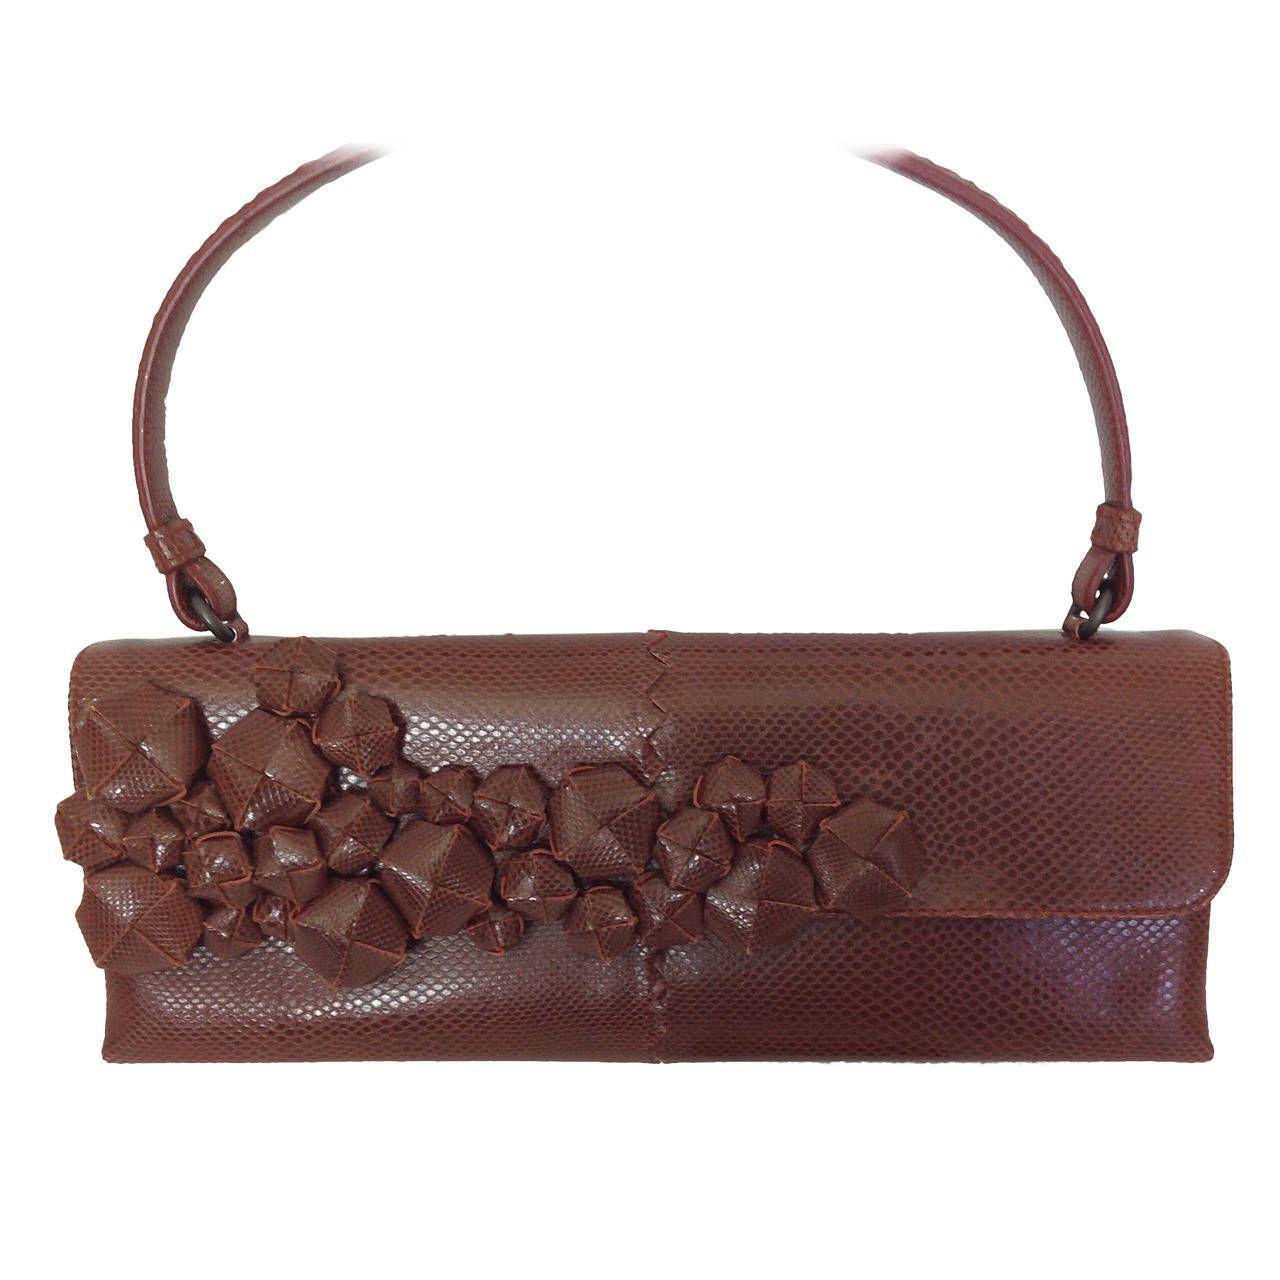 2a46d3af2e6 Cinnamon lizard Bottega Veneta handbag in 2018